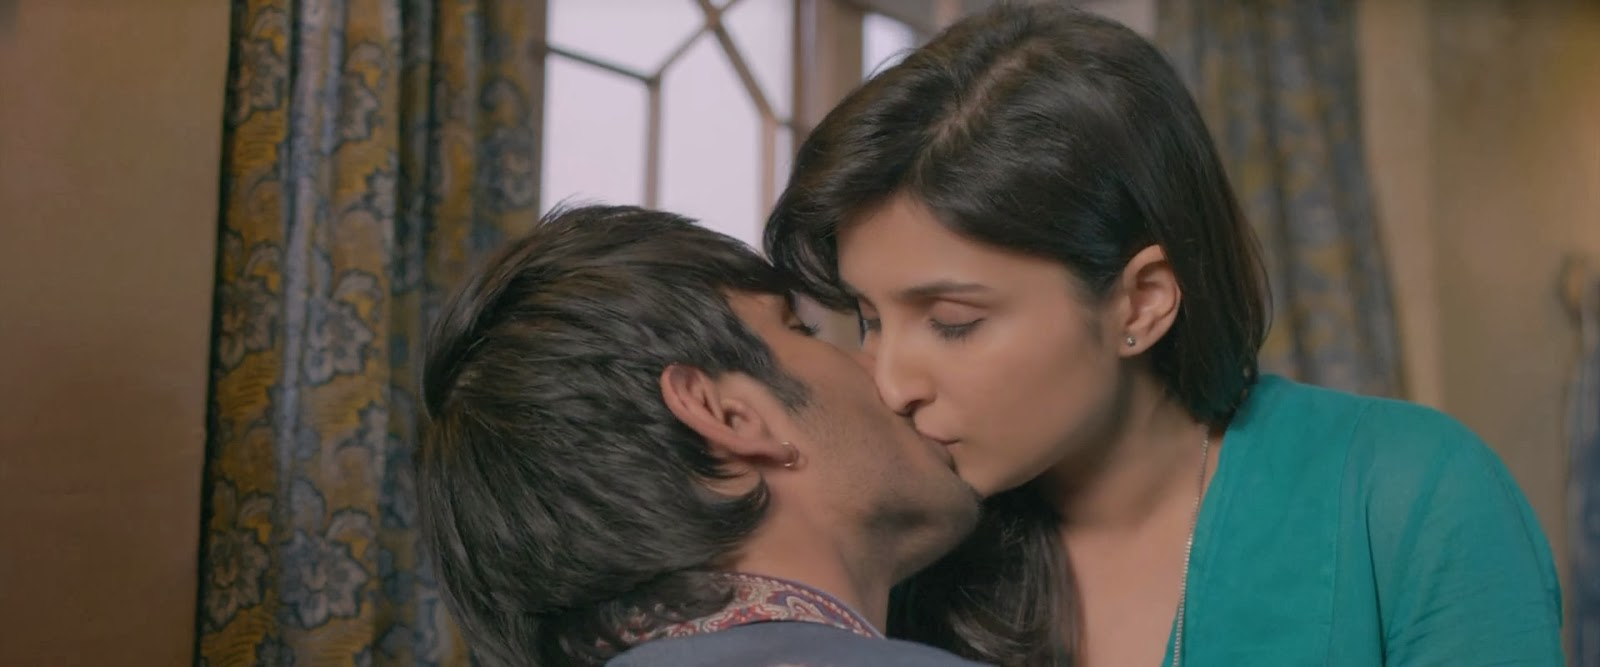 Shuddh Desi Romance (2013) S5 s Shuddh Desi Romance (2013)